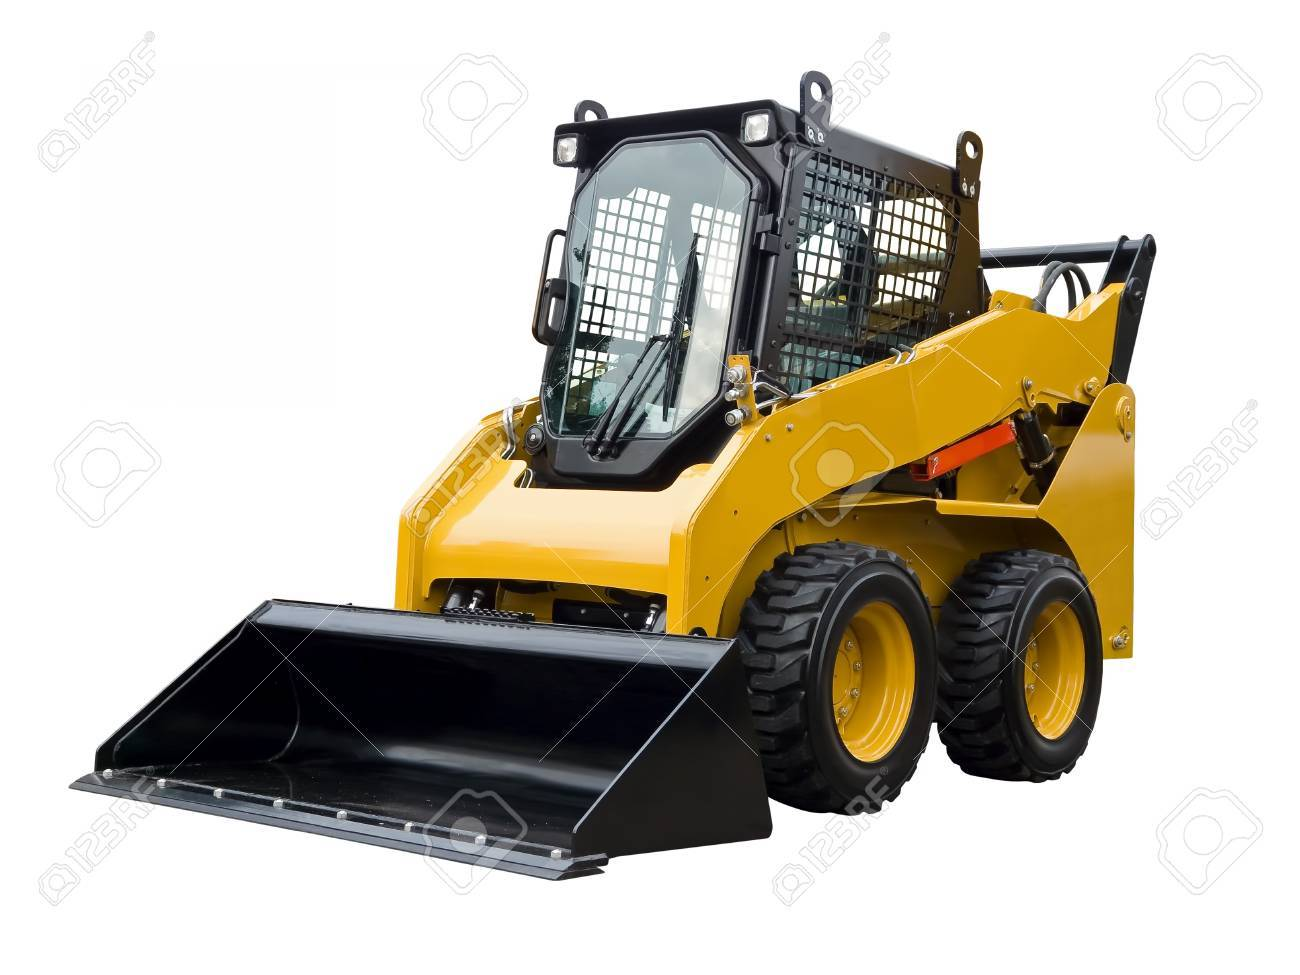 Small buldozer Stock Photo - 21621476